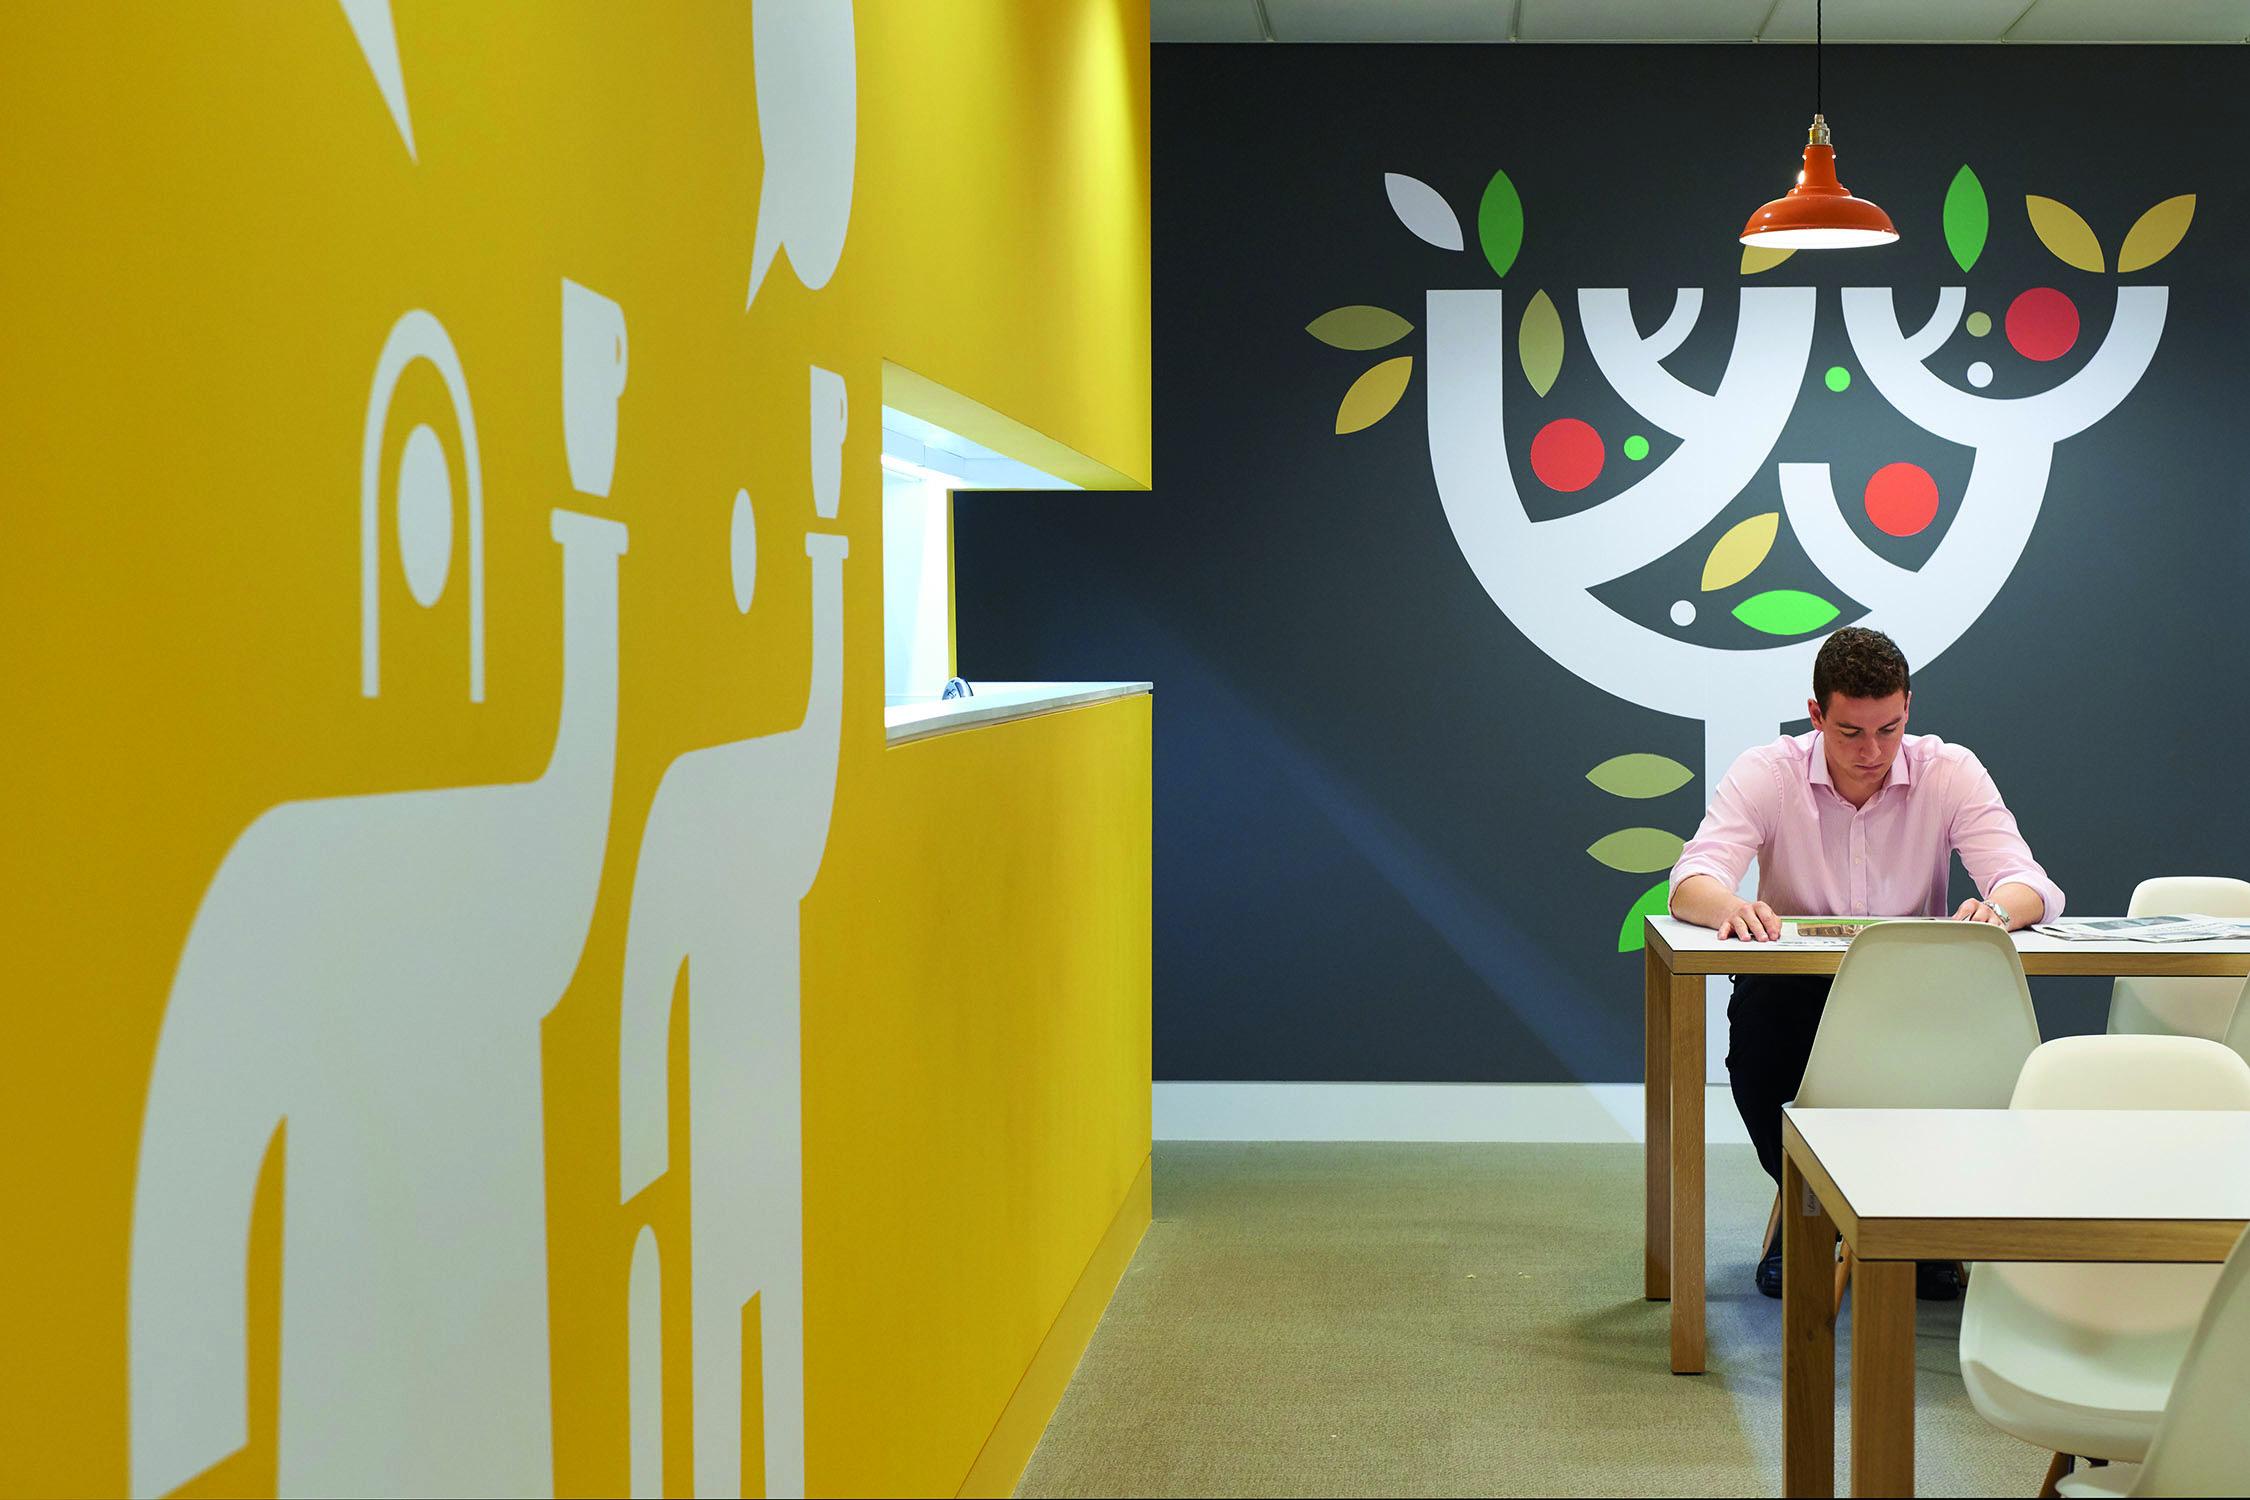 Osborne Clarke LLP Best Recruiter – National/Large Regional Firm | Office